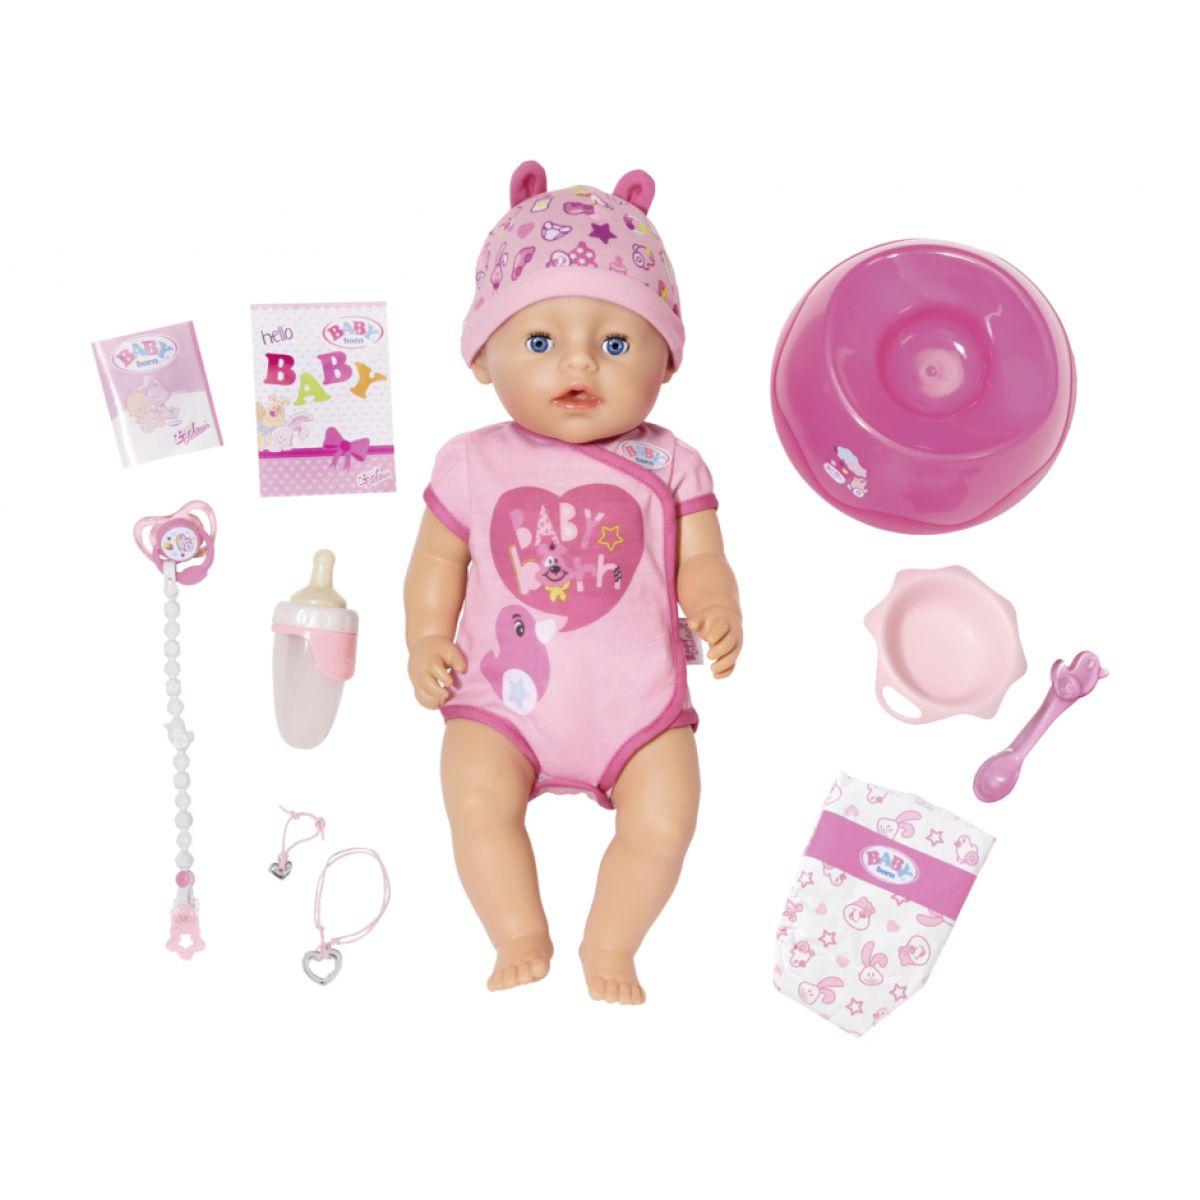 Zapf Creation Baby Born Soft Touch dievčatko 43 cm